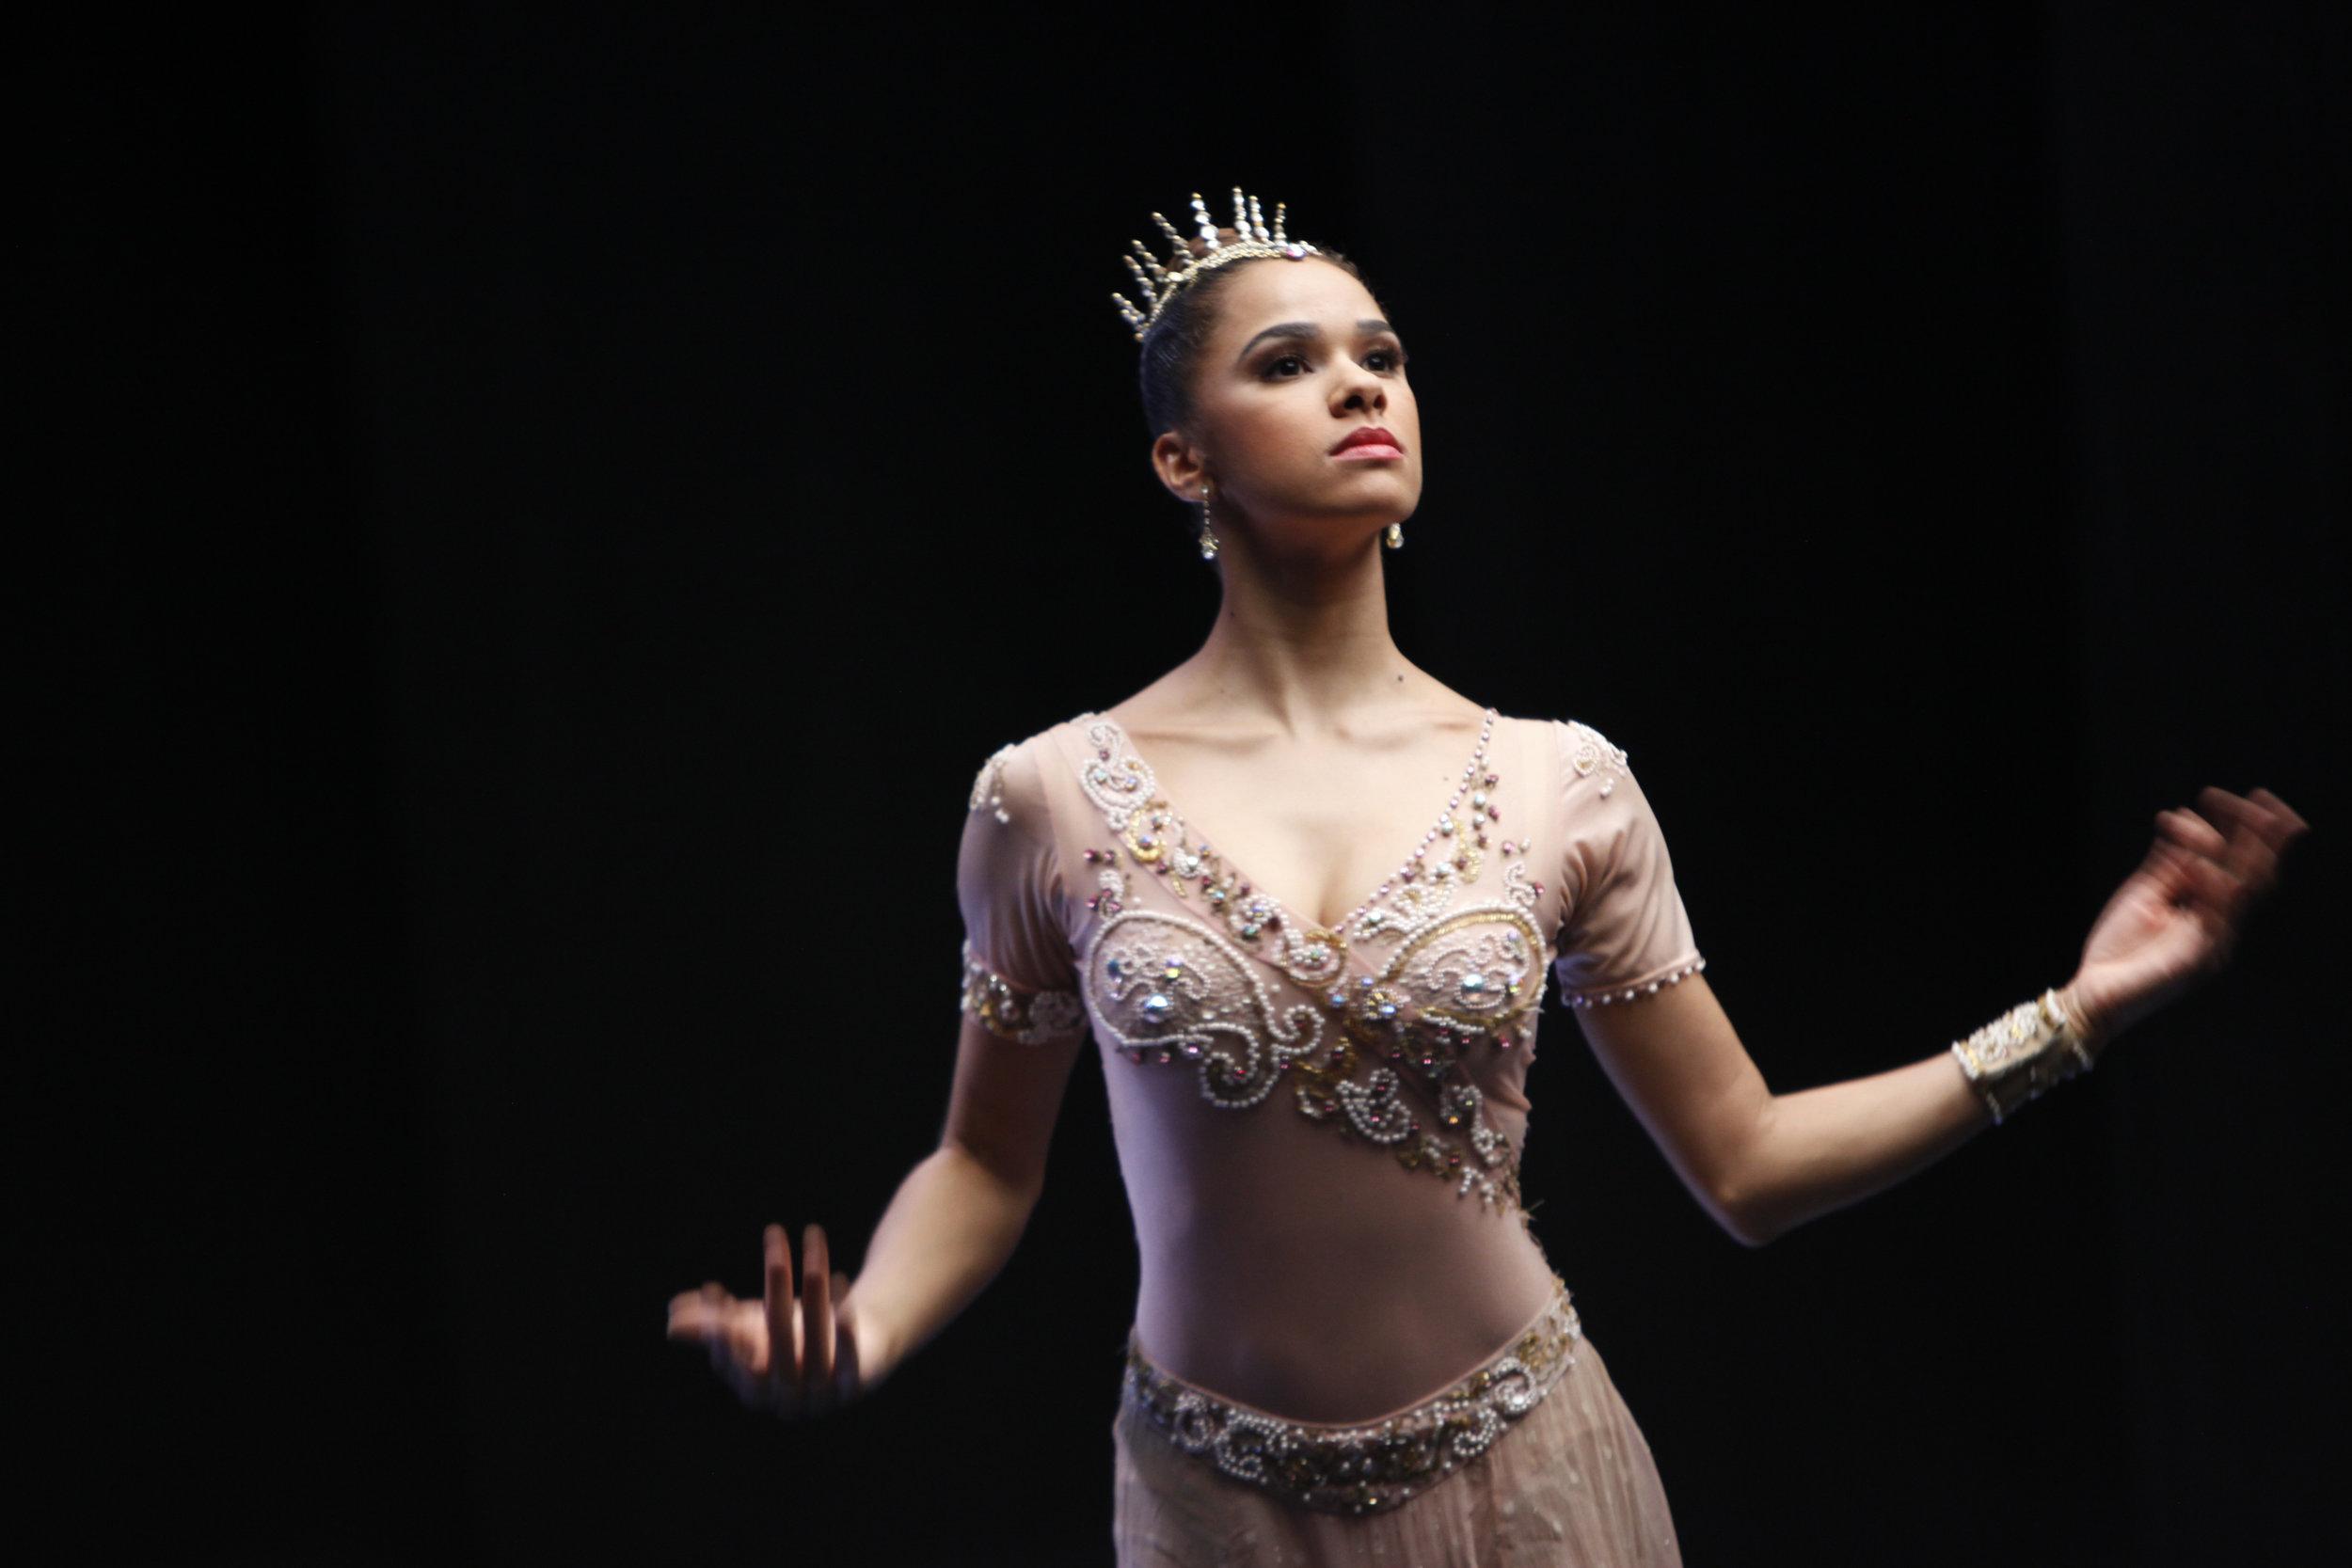 A Ballerina's Tale - Read more